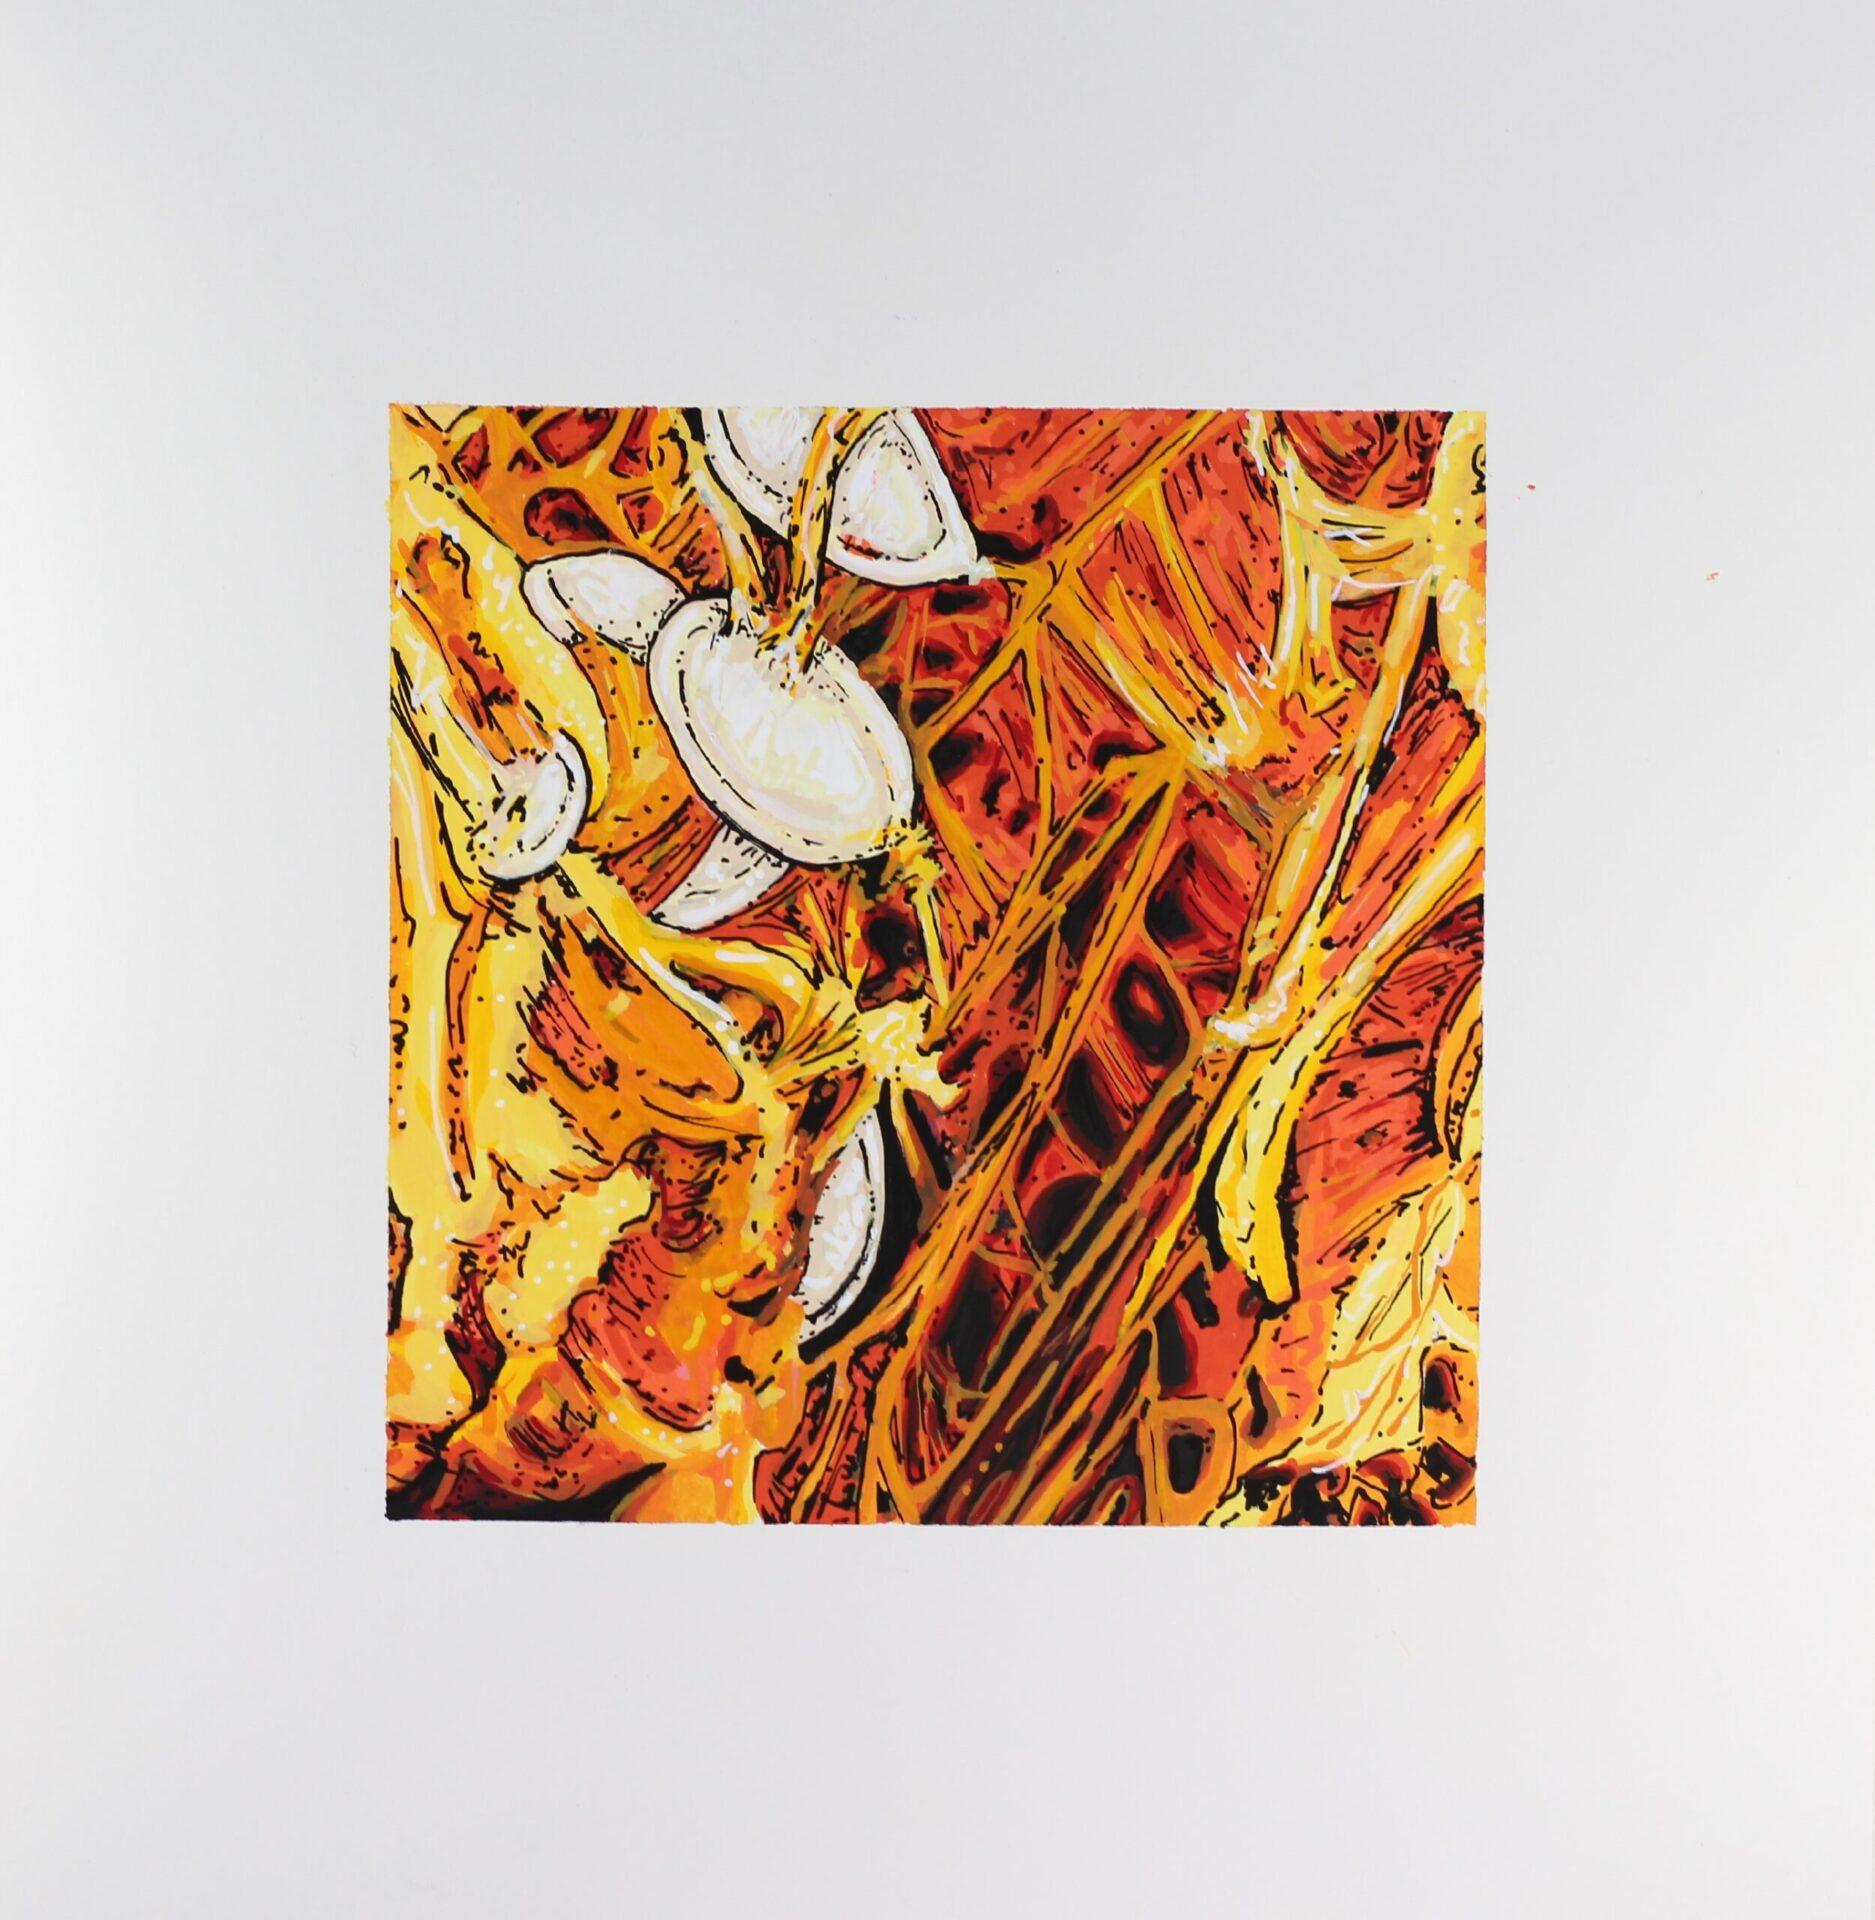 "Angela Faustina, PUMPKIN painting, 2021. Mixed media, 10"" by 10"" total"